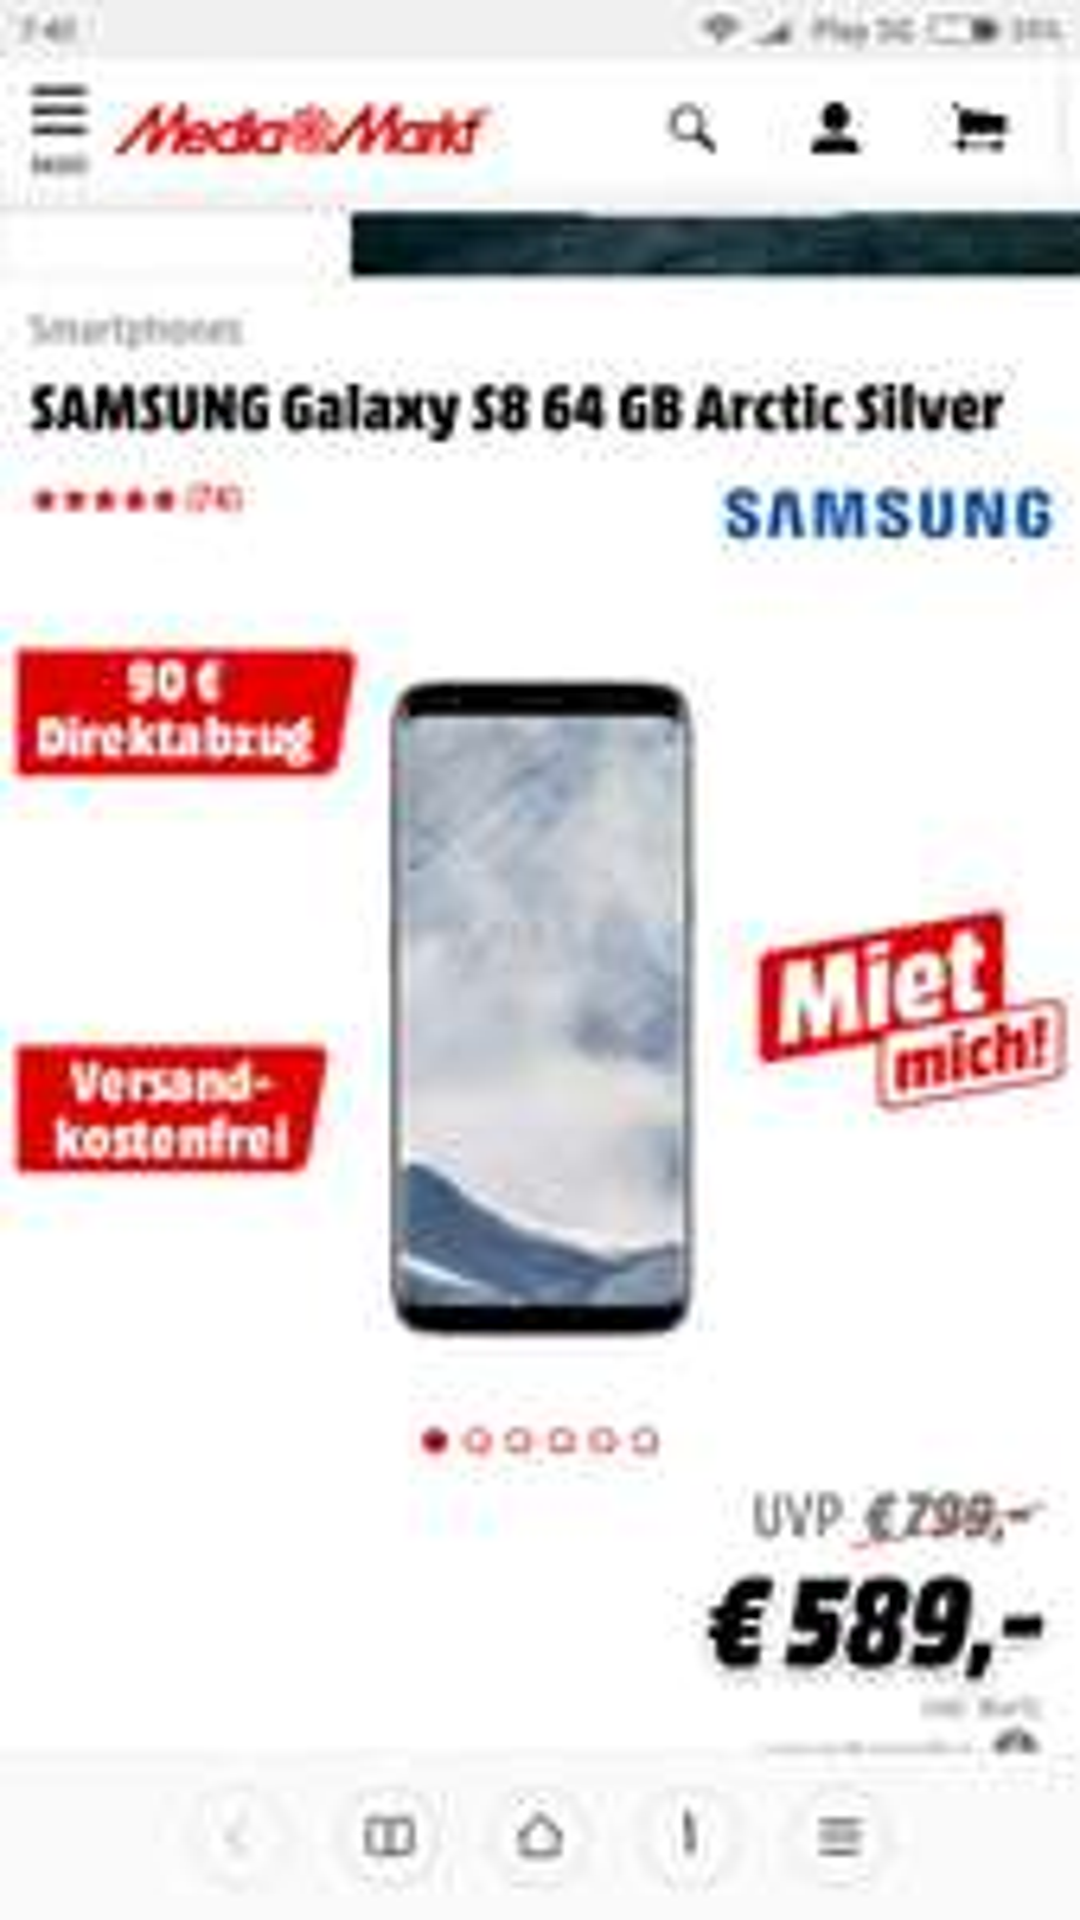 S8 za 499 kapustionów w MediaMarkt.de